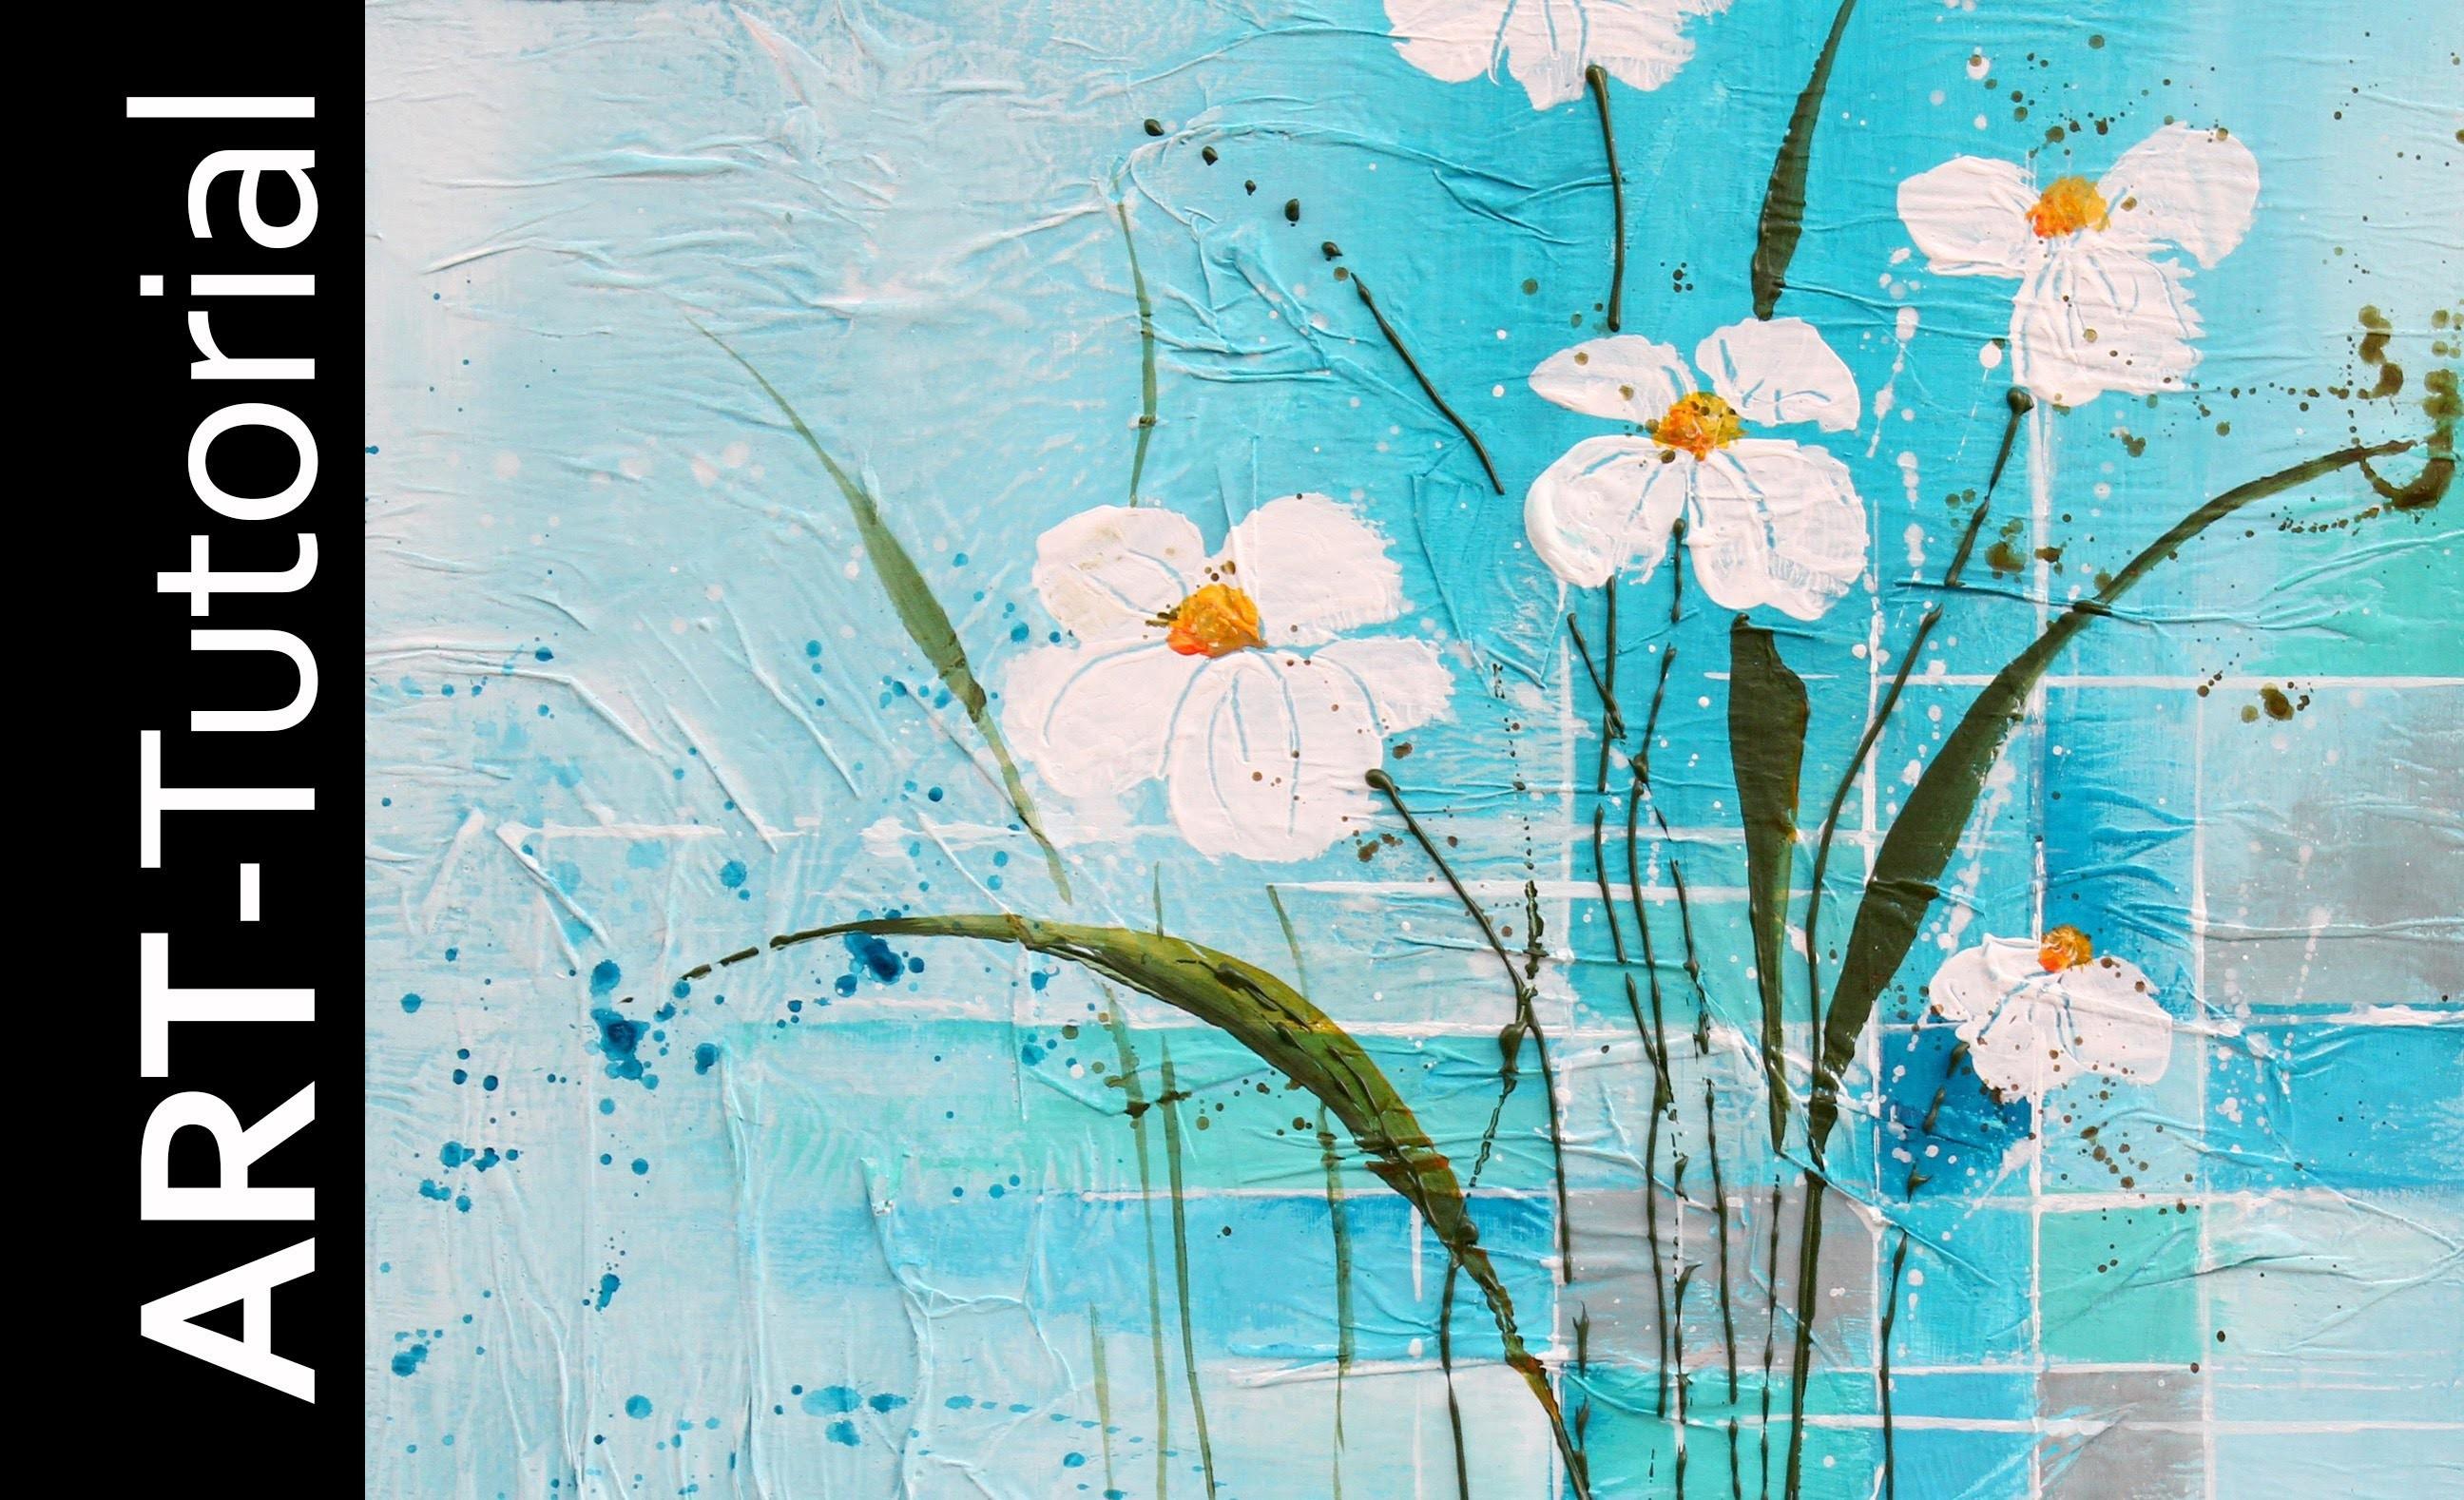 ZAcheR-finet Tutorial - Acrylmalen Workshop - Acrylic painting Malen mit Isabelle 13